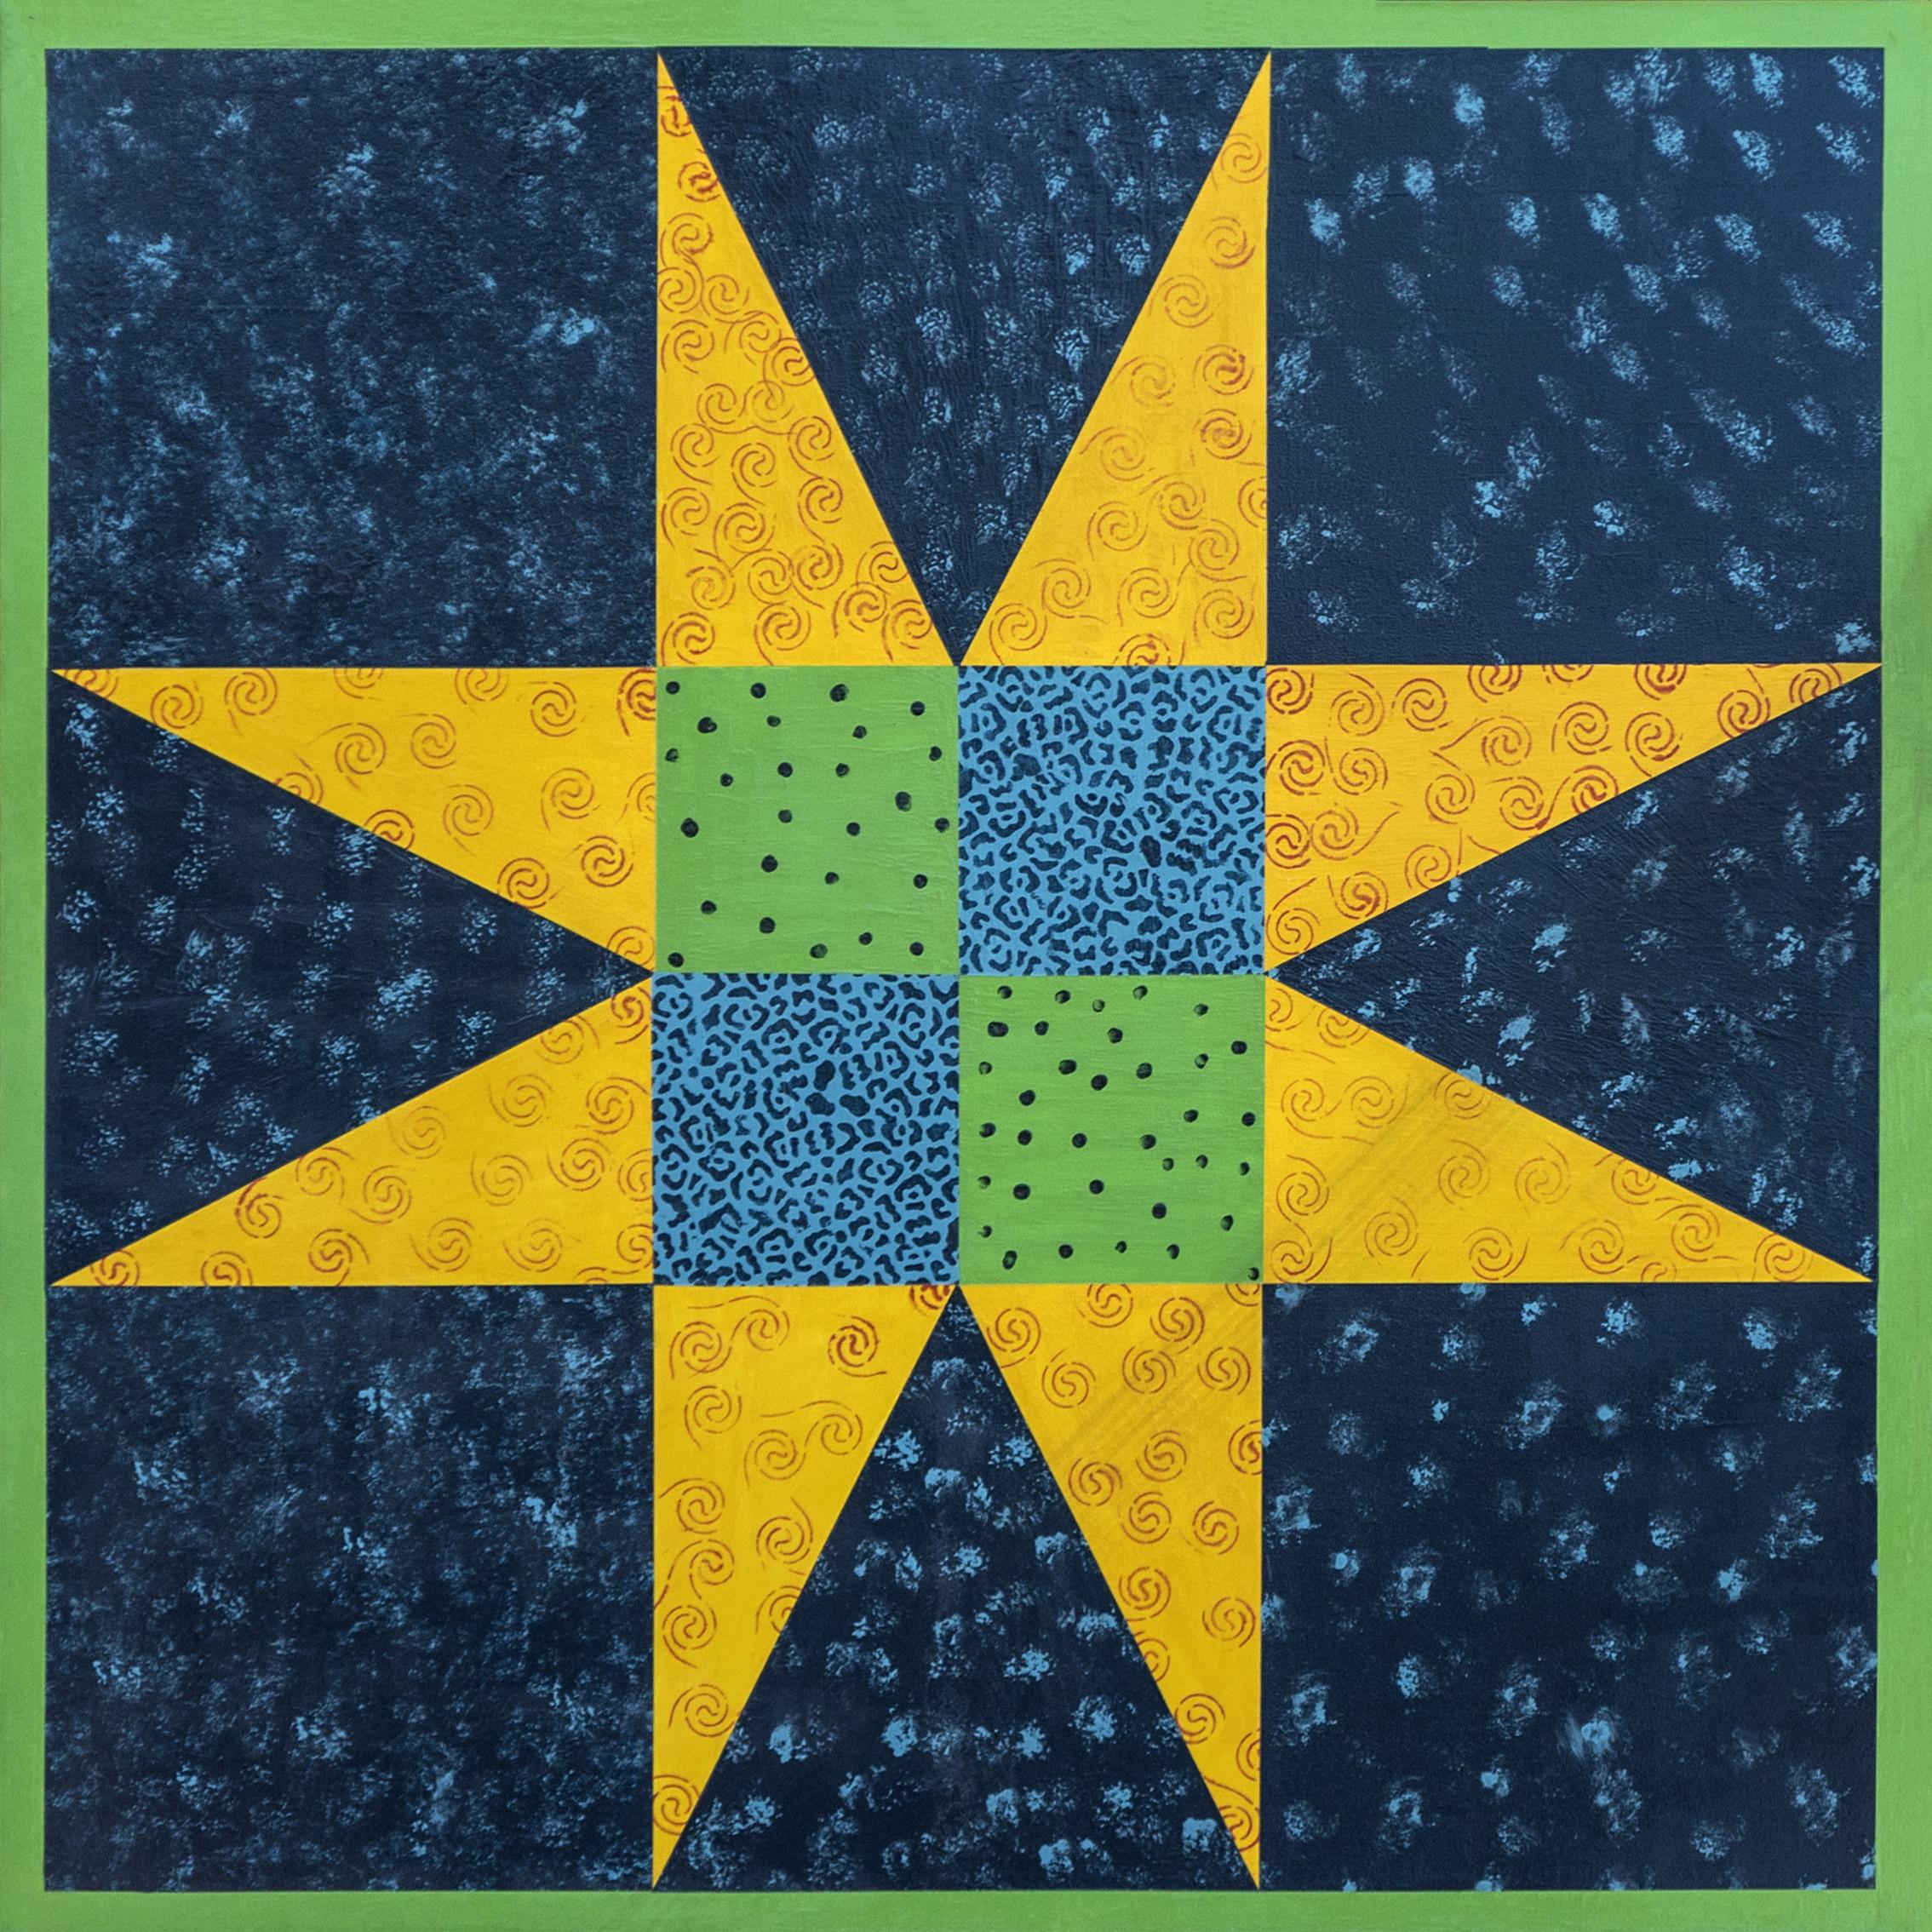 21. Starry Night